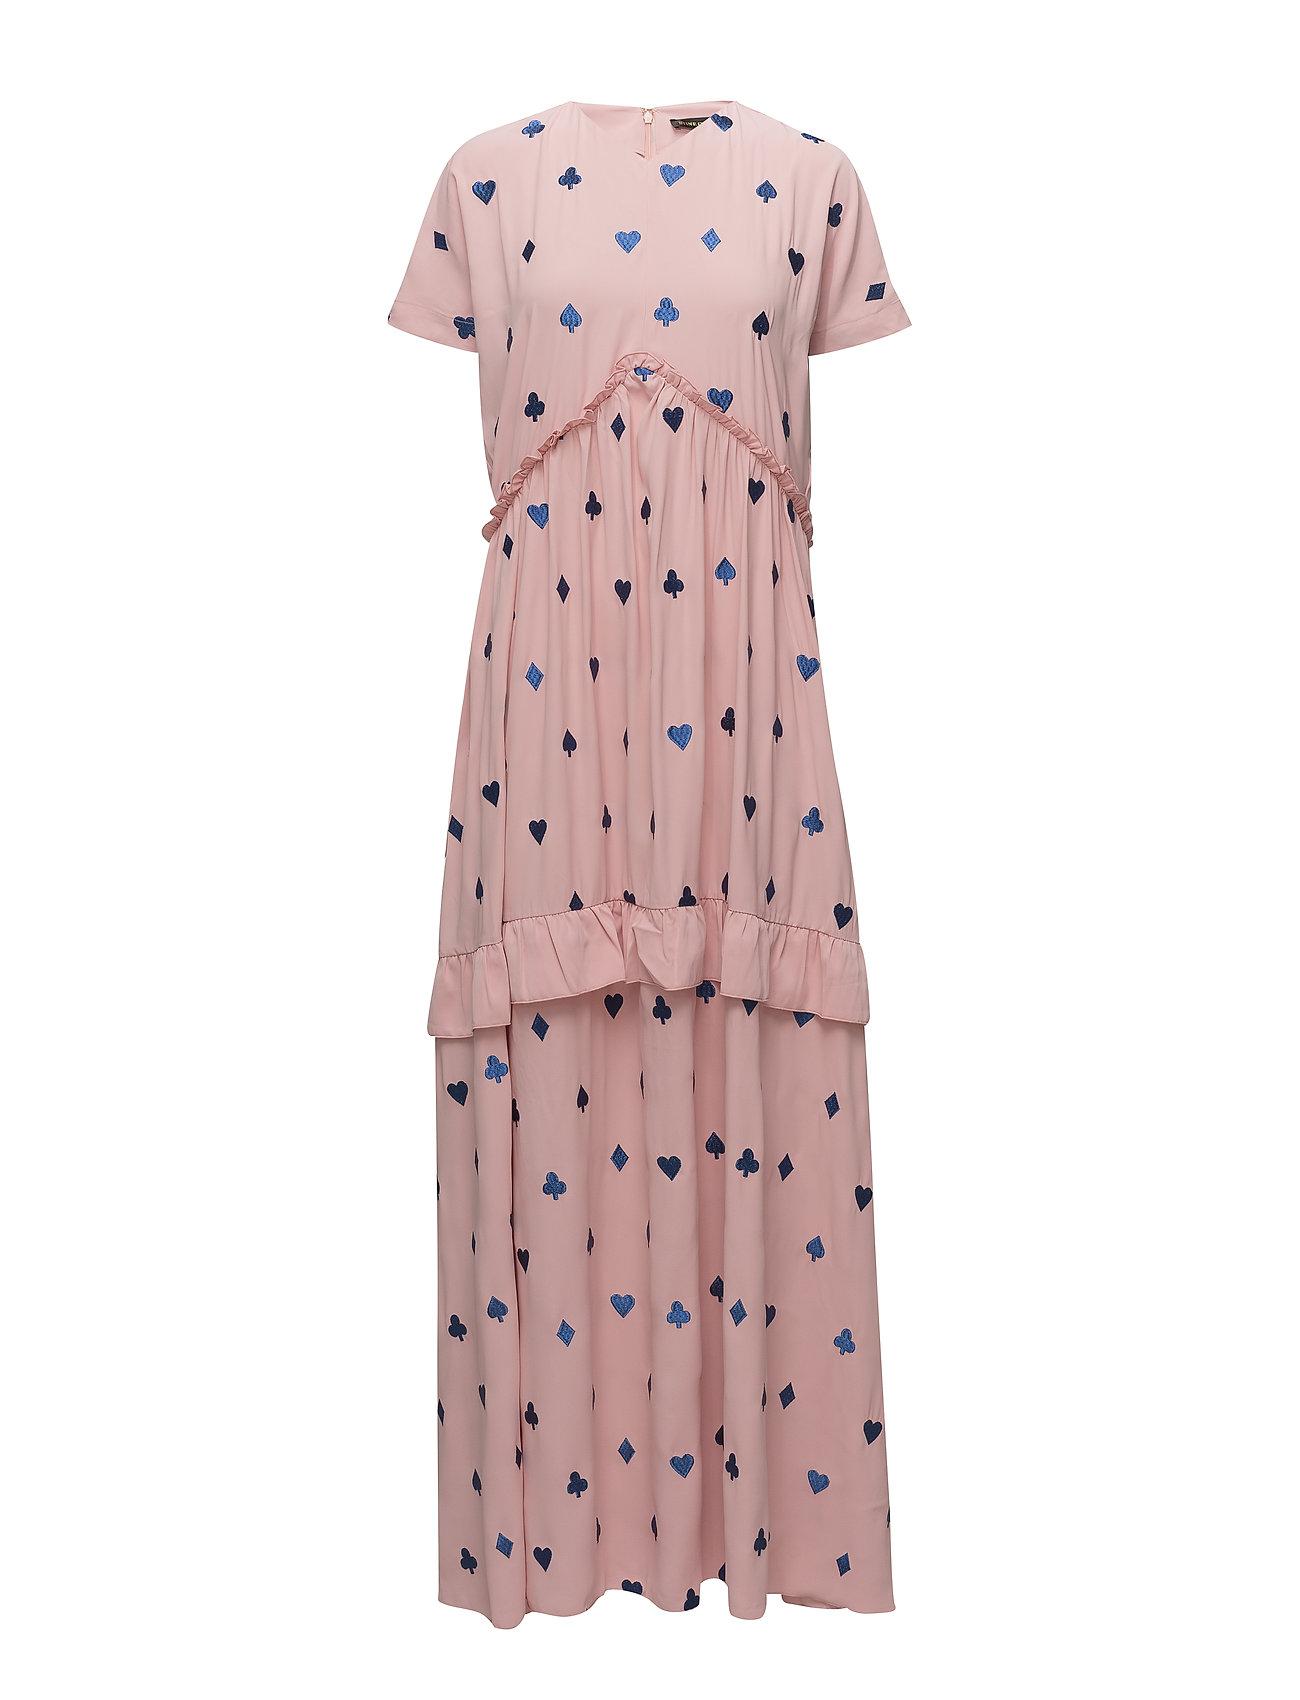 b848c9b420df Stine Suitmarks 442 Embroidery Milla £154 Goya suitmarks Pink wYPOg